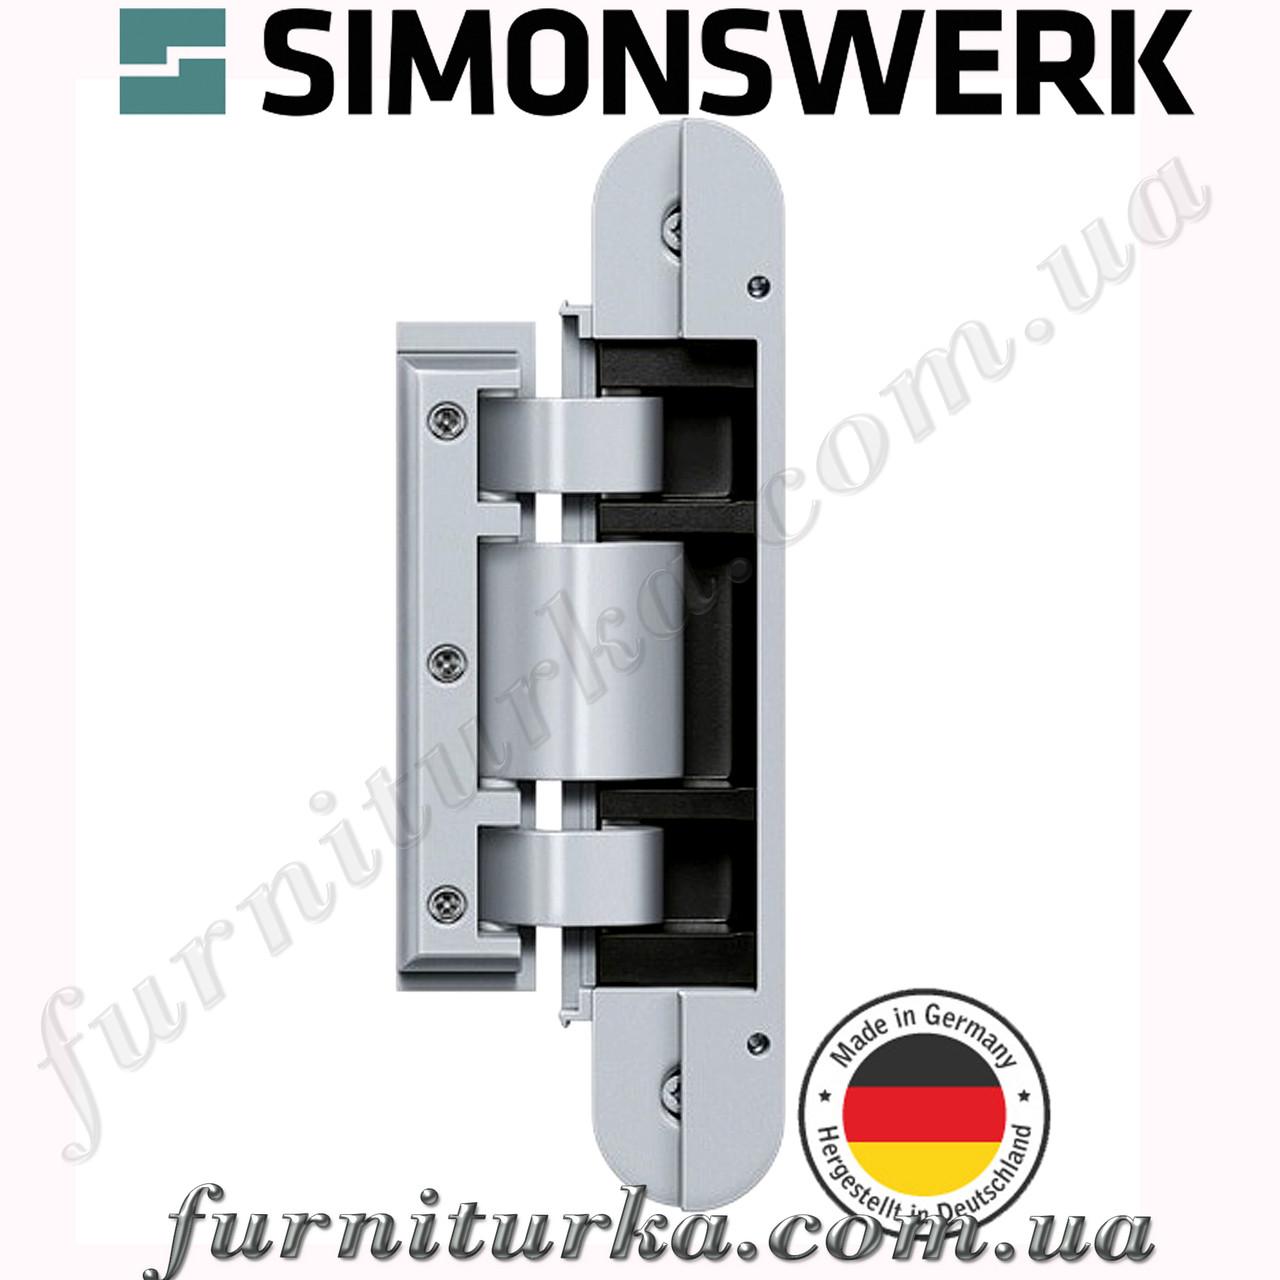 Петля для цельностеклянных дверей TEG 310 2D 60 (F1 сатин хром)